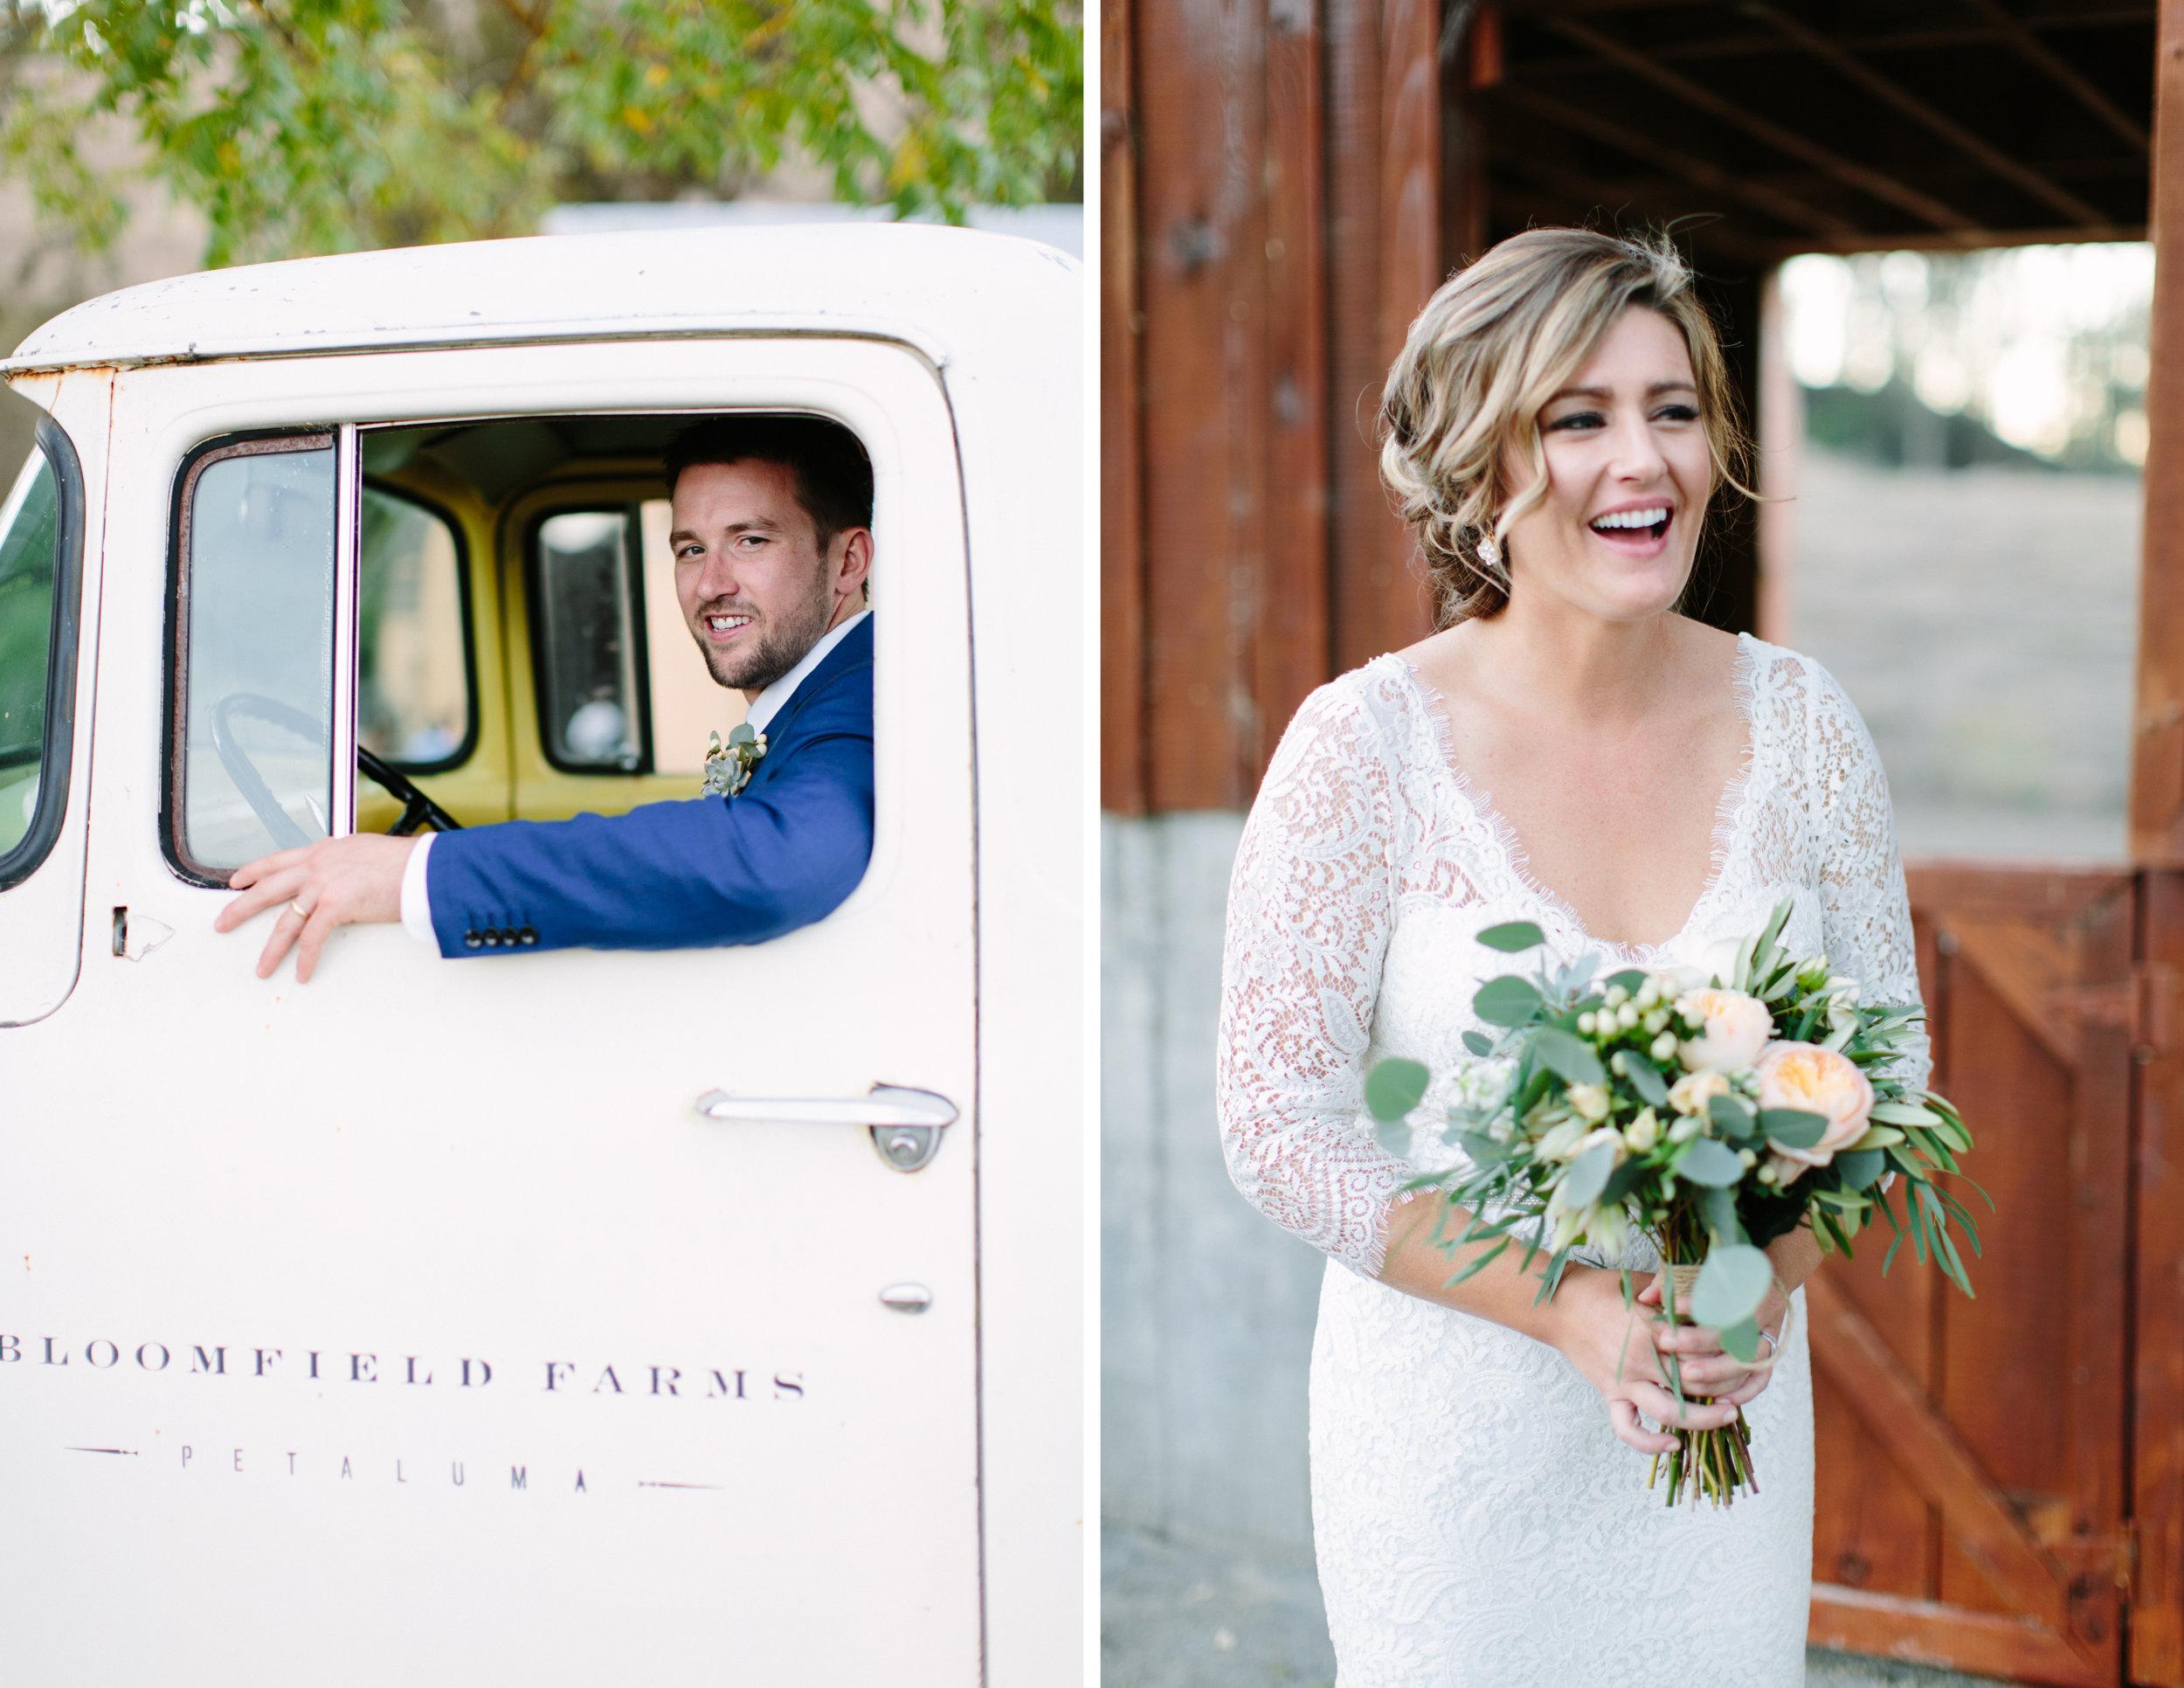 bloomfield farms wedding 11.jpg